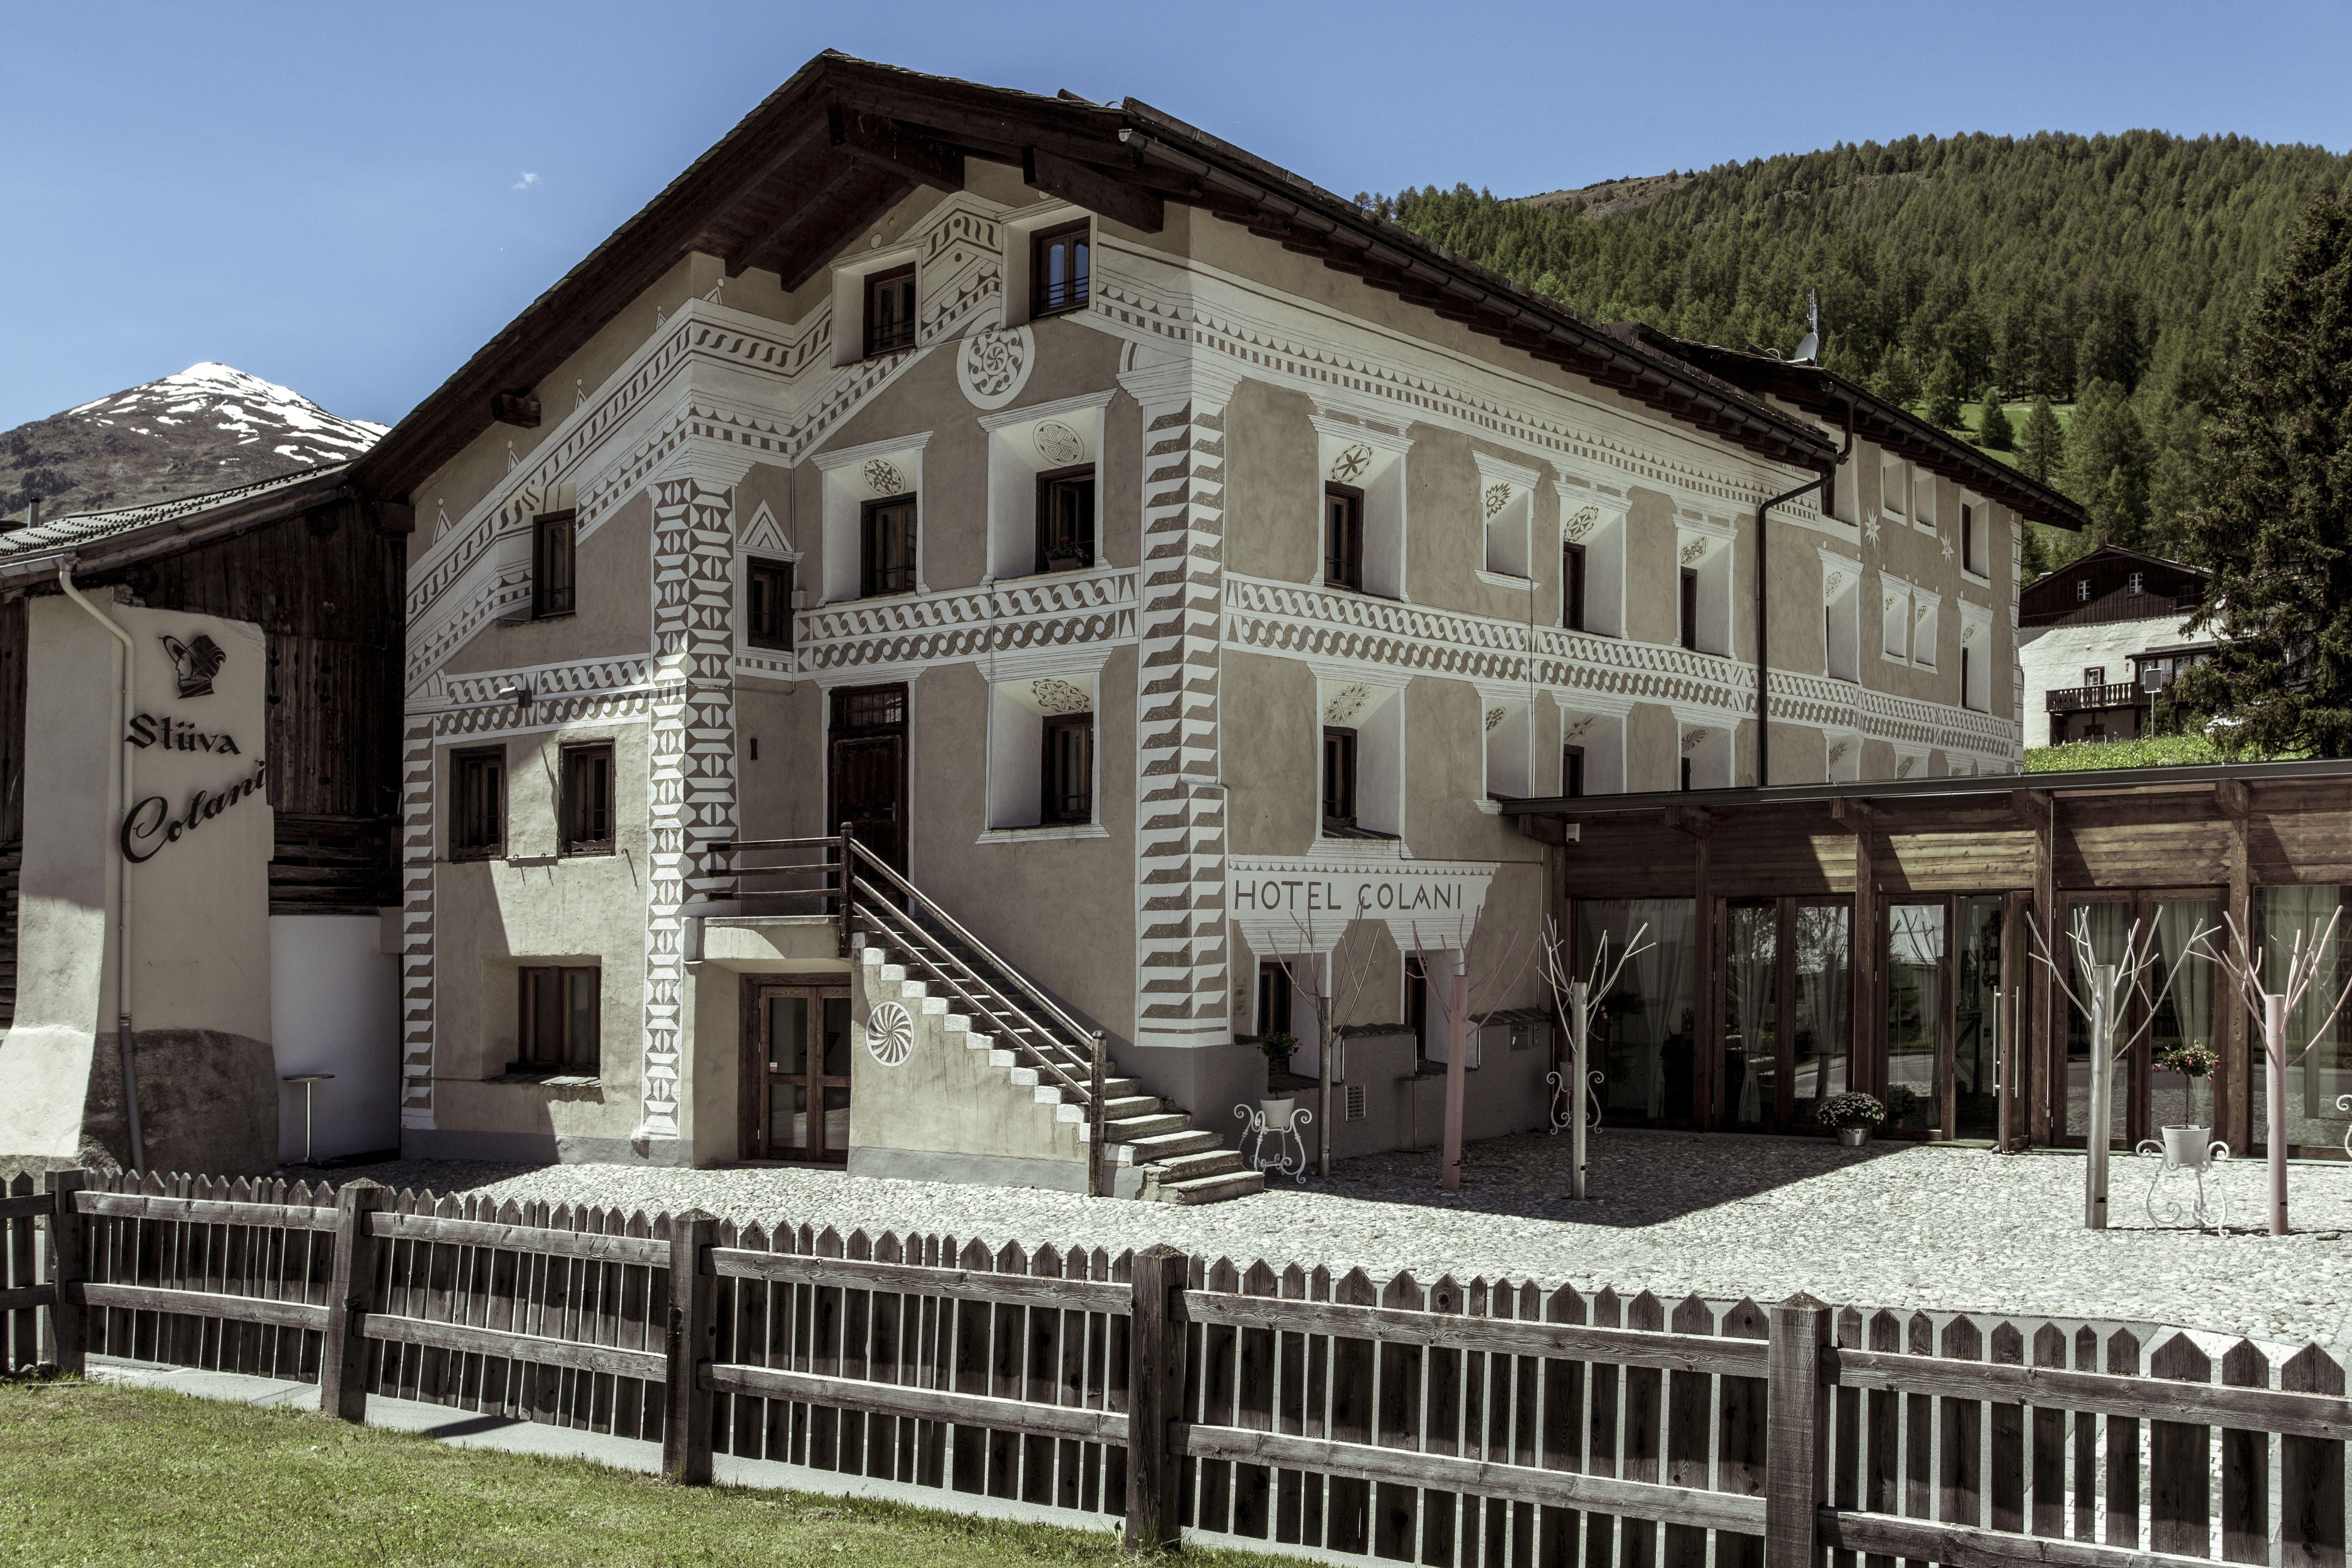 Hotels in Madulain